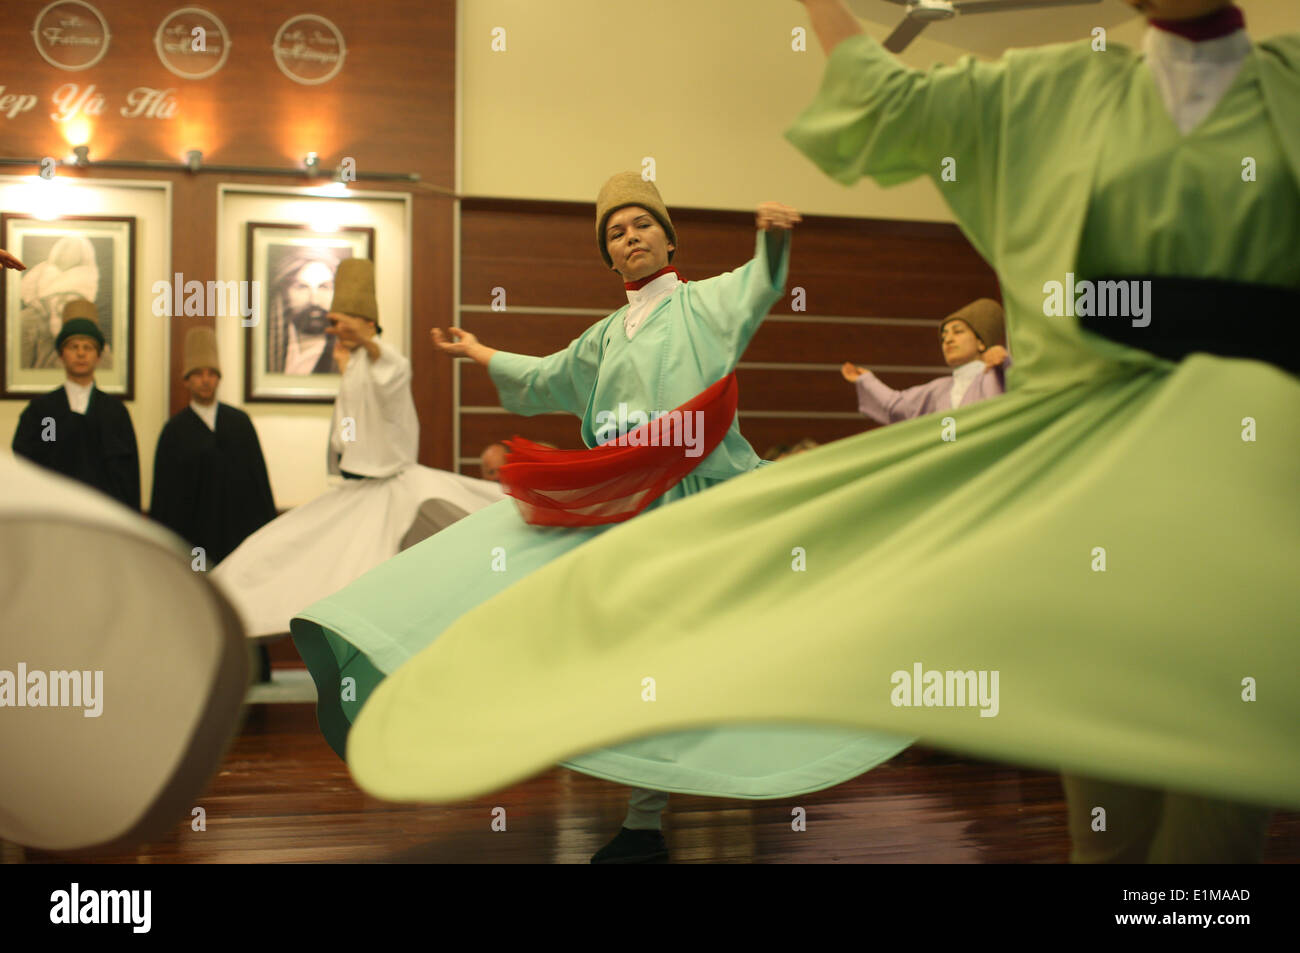 Whirling dervishes performance in Silvrikapi Meylana cultural center. - Stock Image